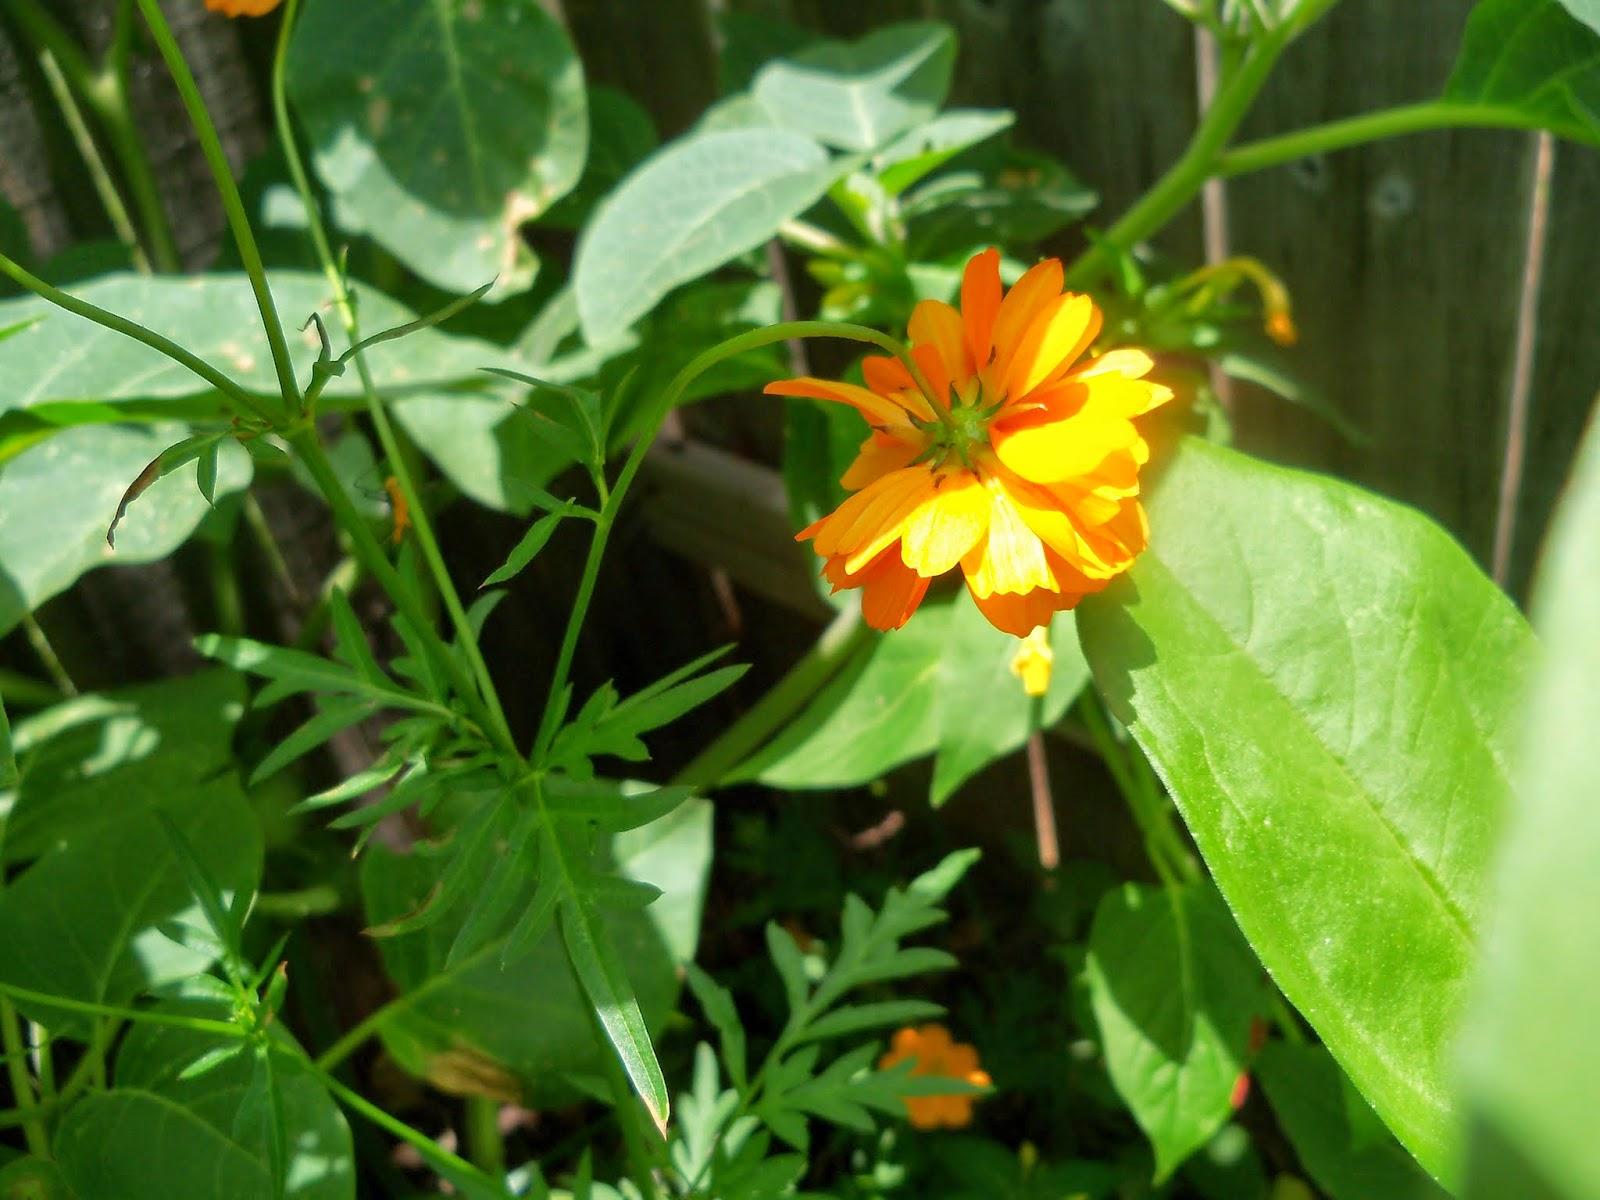 Gardening 2014 - 116_2980.JPG